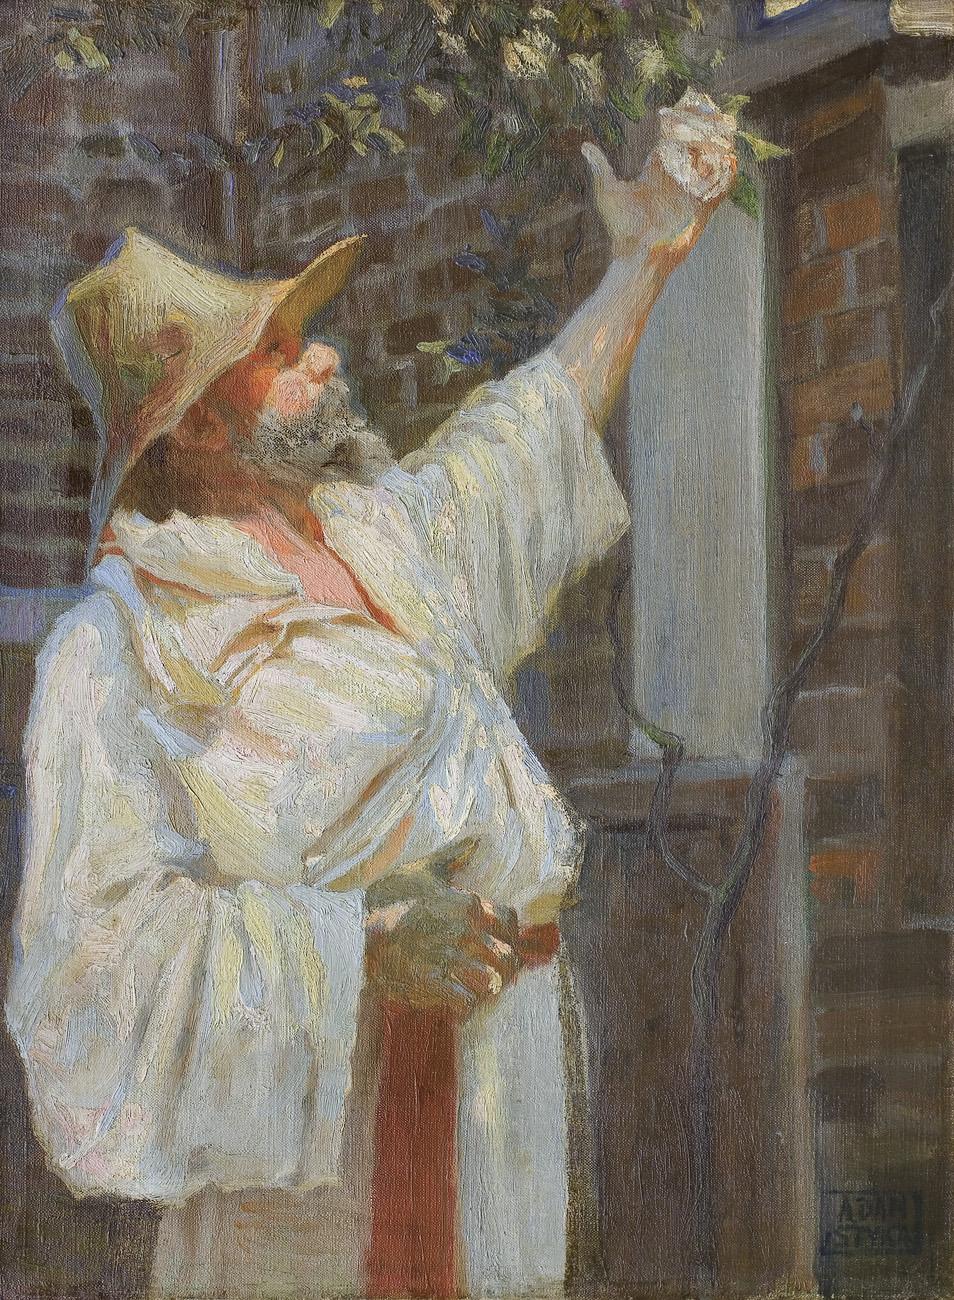 PORTRET JANA STYKI, OJCA ARTYSTY, NA CAPRI, ok. 1920